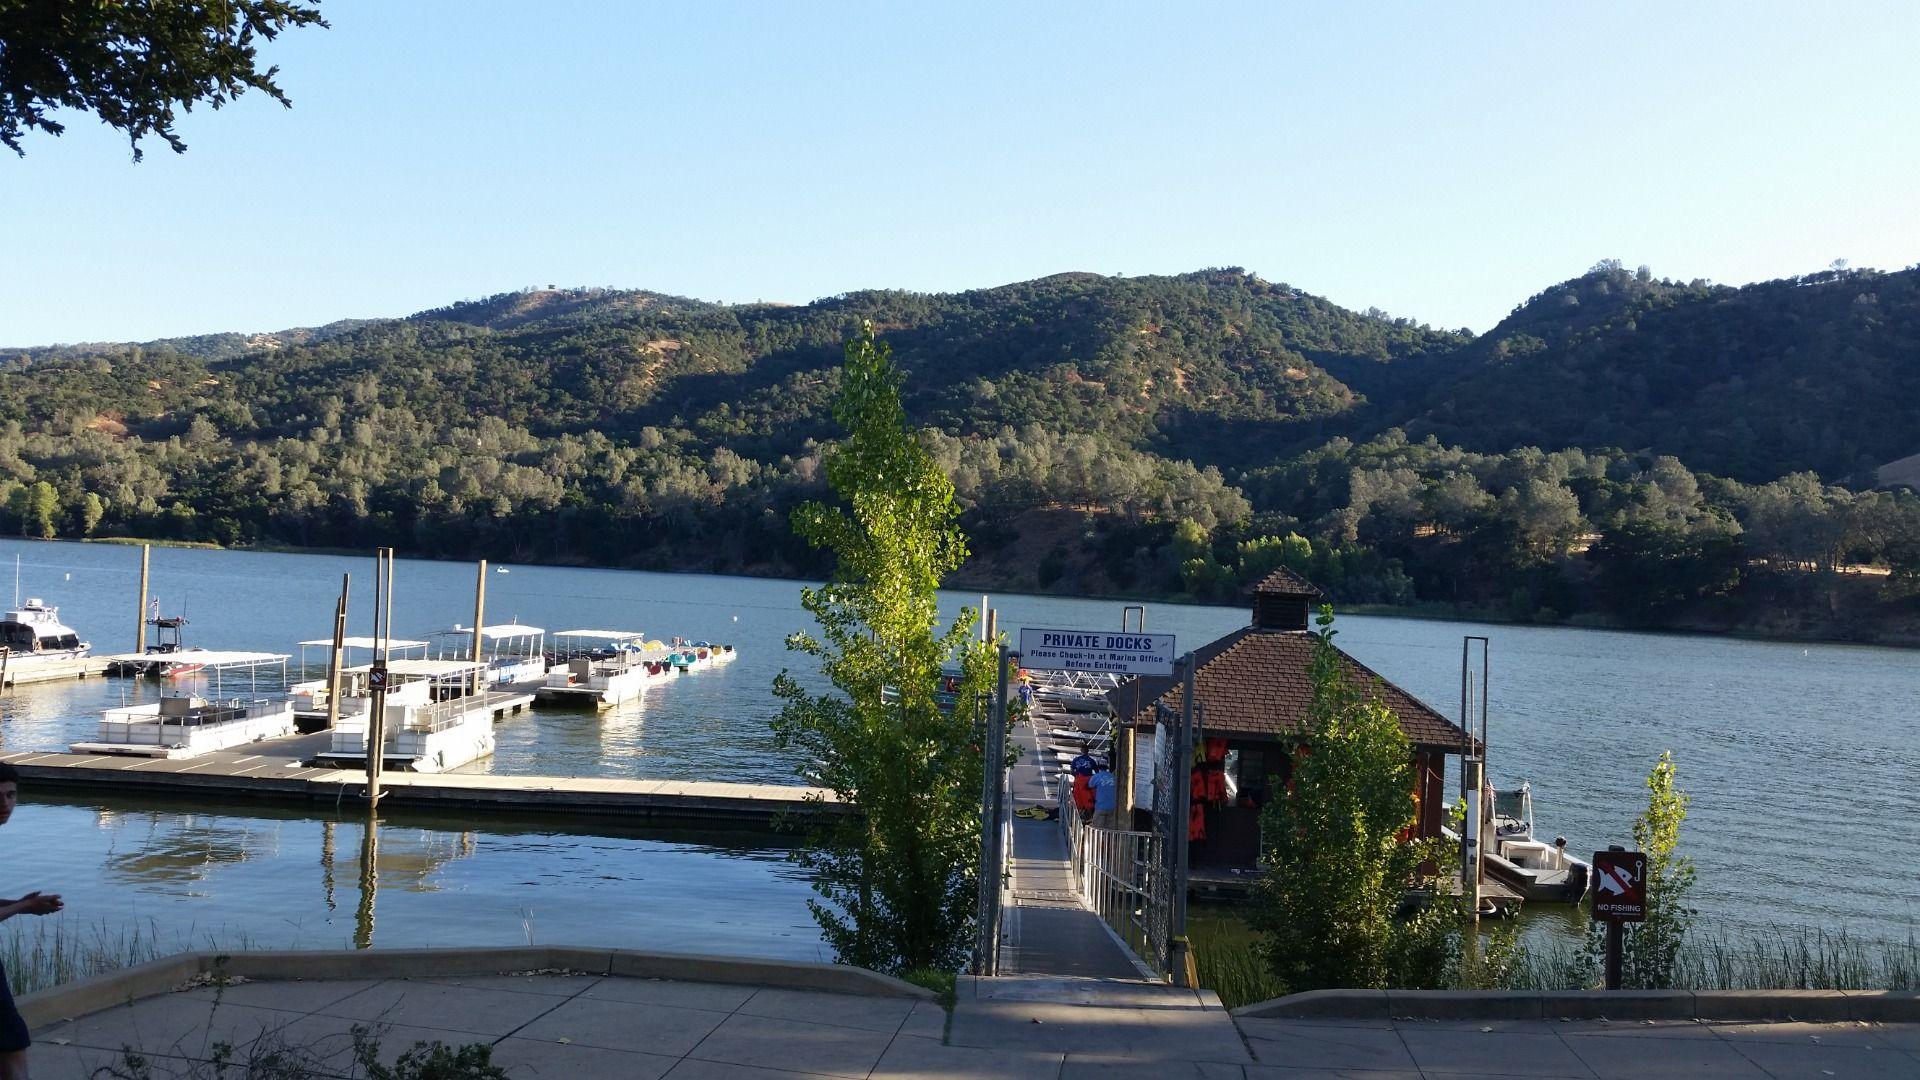 Boating deck in lake del valle del valle regional park